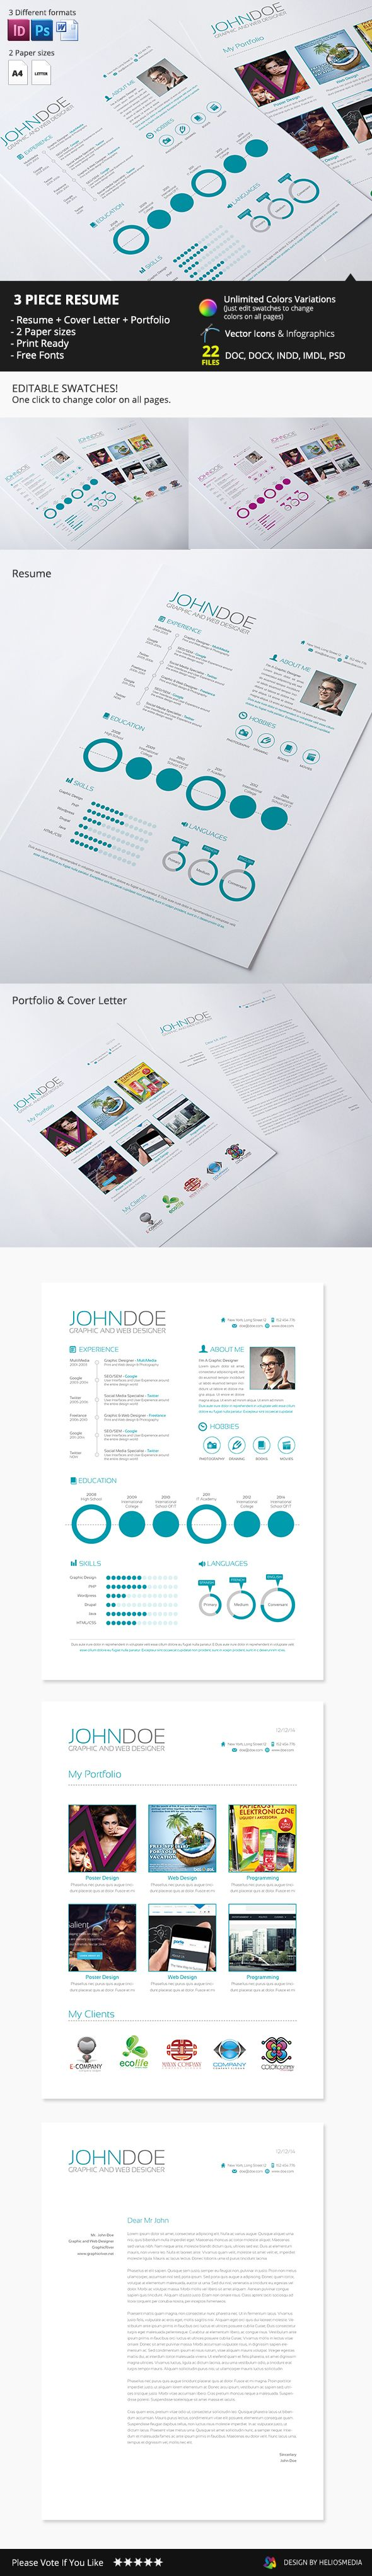 best ideas about modern resume resume cv 17 best ideas about modern resume resume cv template and cv design